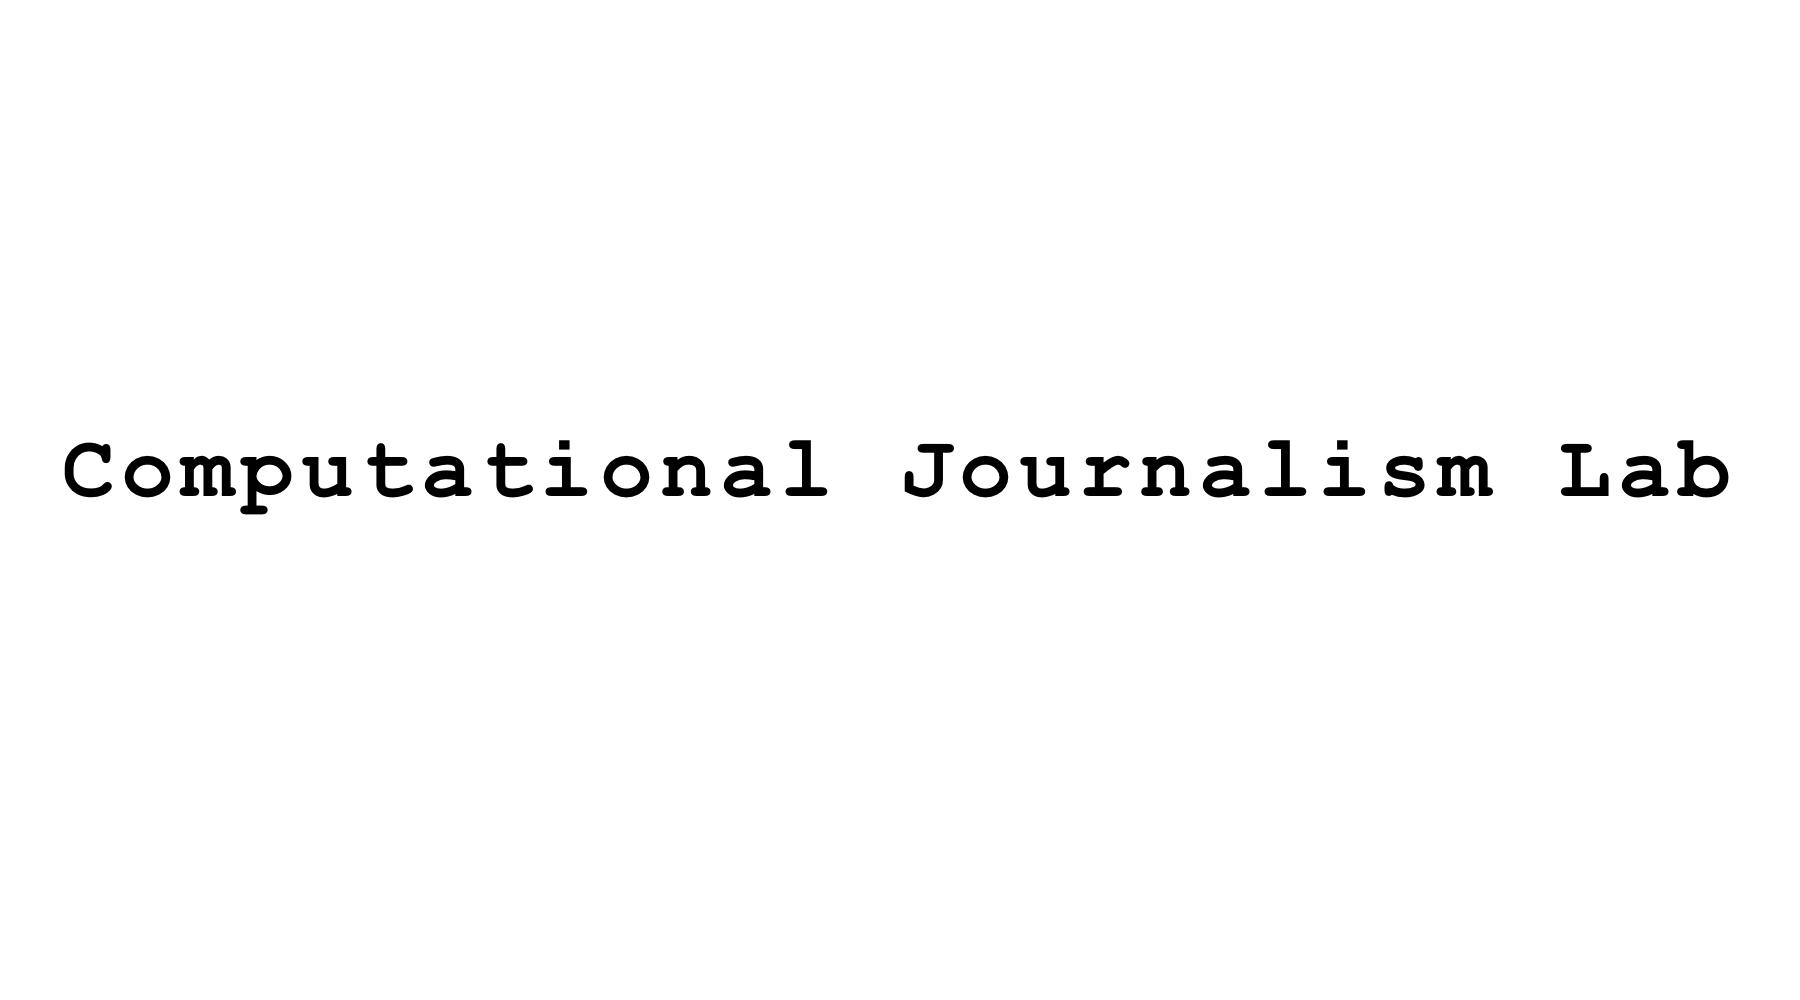 Computational Journalism Lab